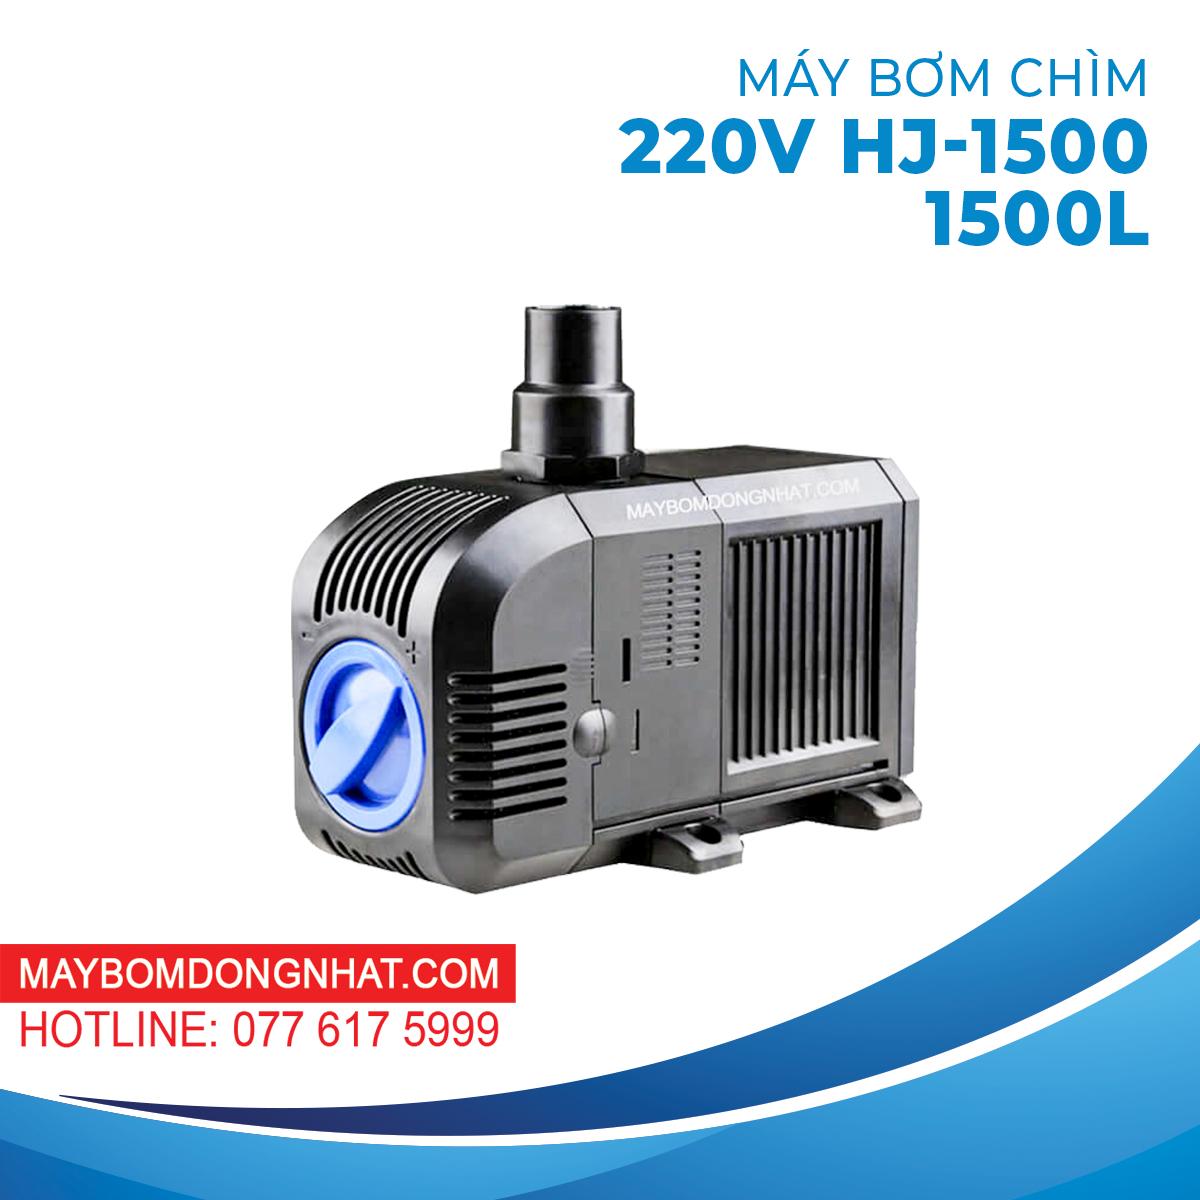 Máy bơm chìm SUNSUN HJ-1500 220V 25W 1500L